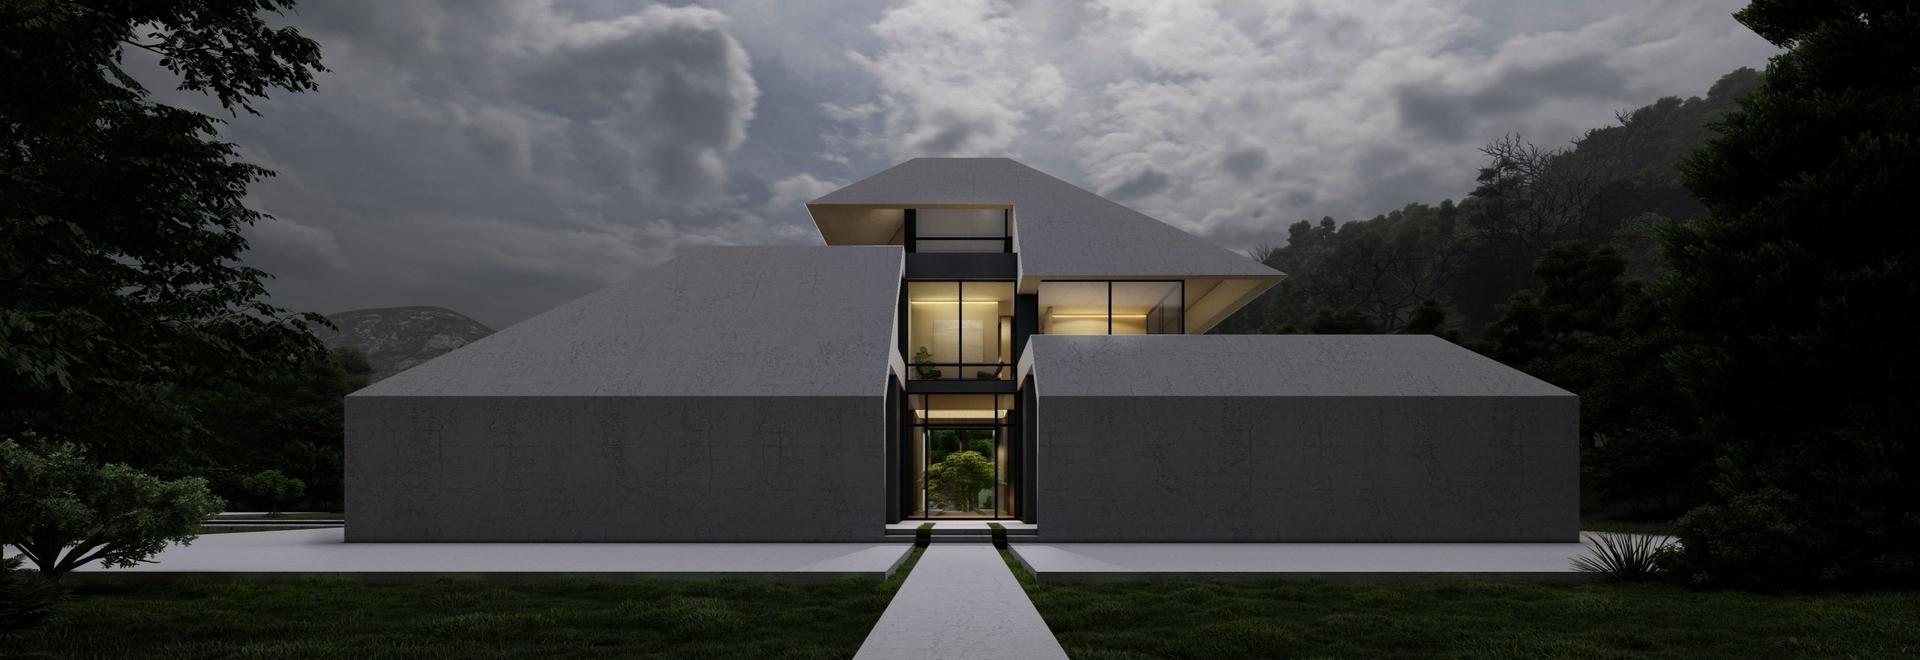 Iran's humid, rainy region informs the gabled 'gilak villa' by Team Design Group